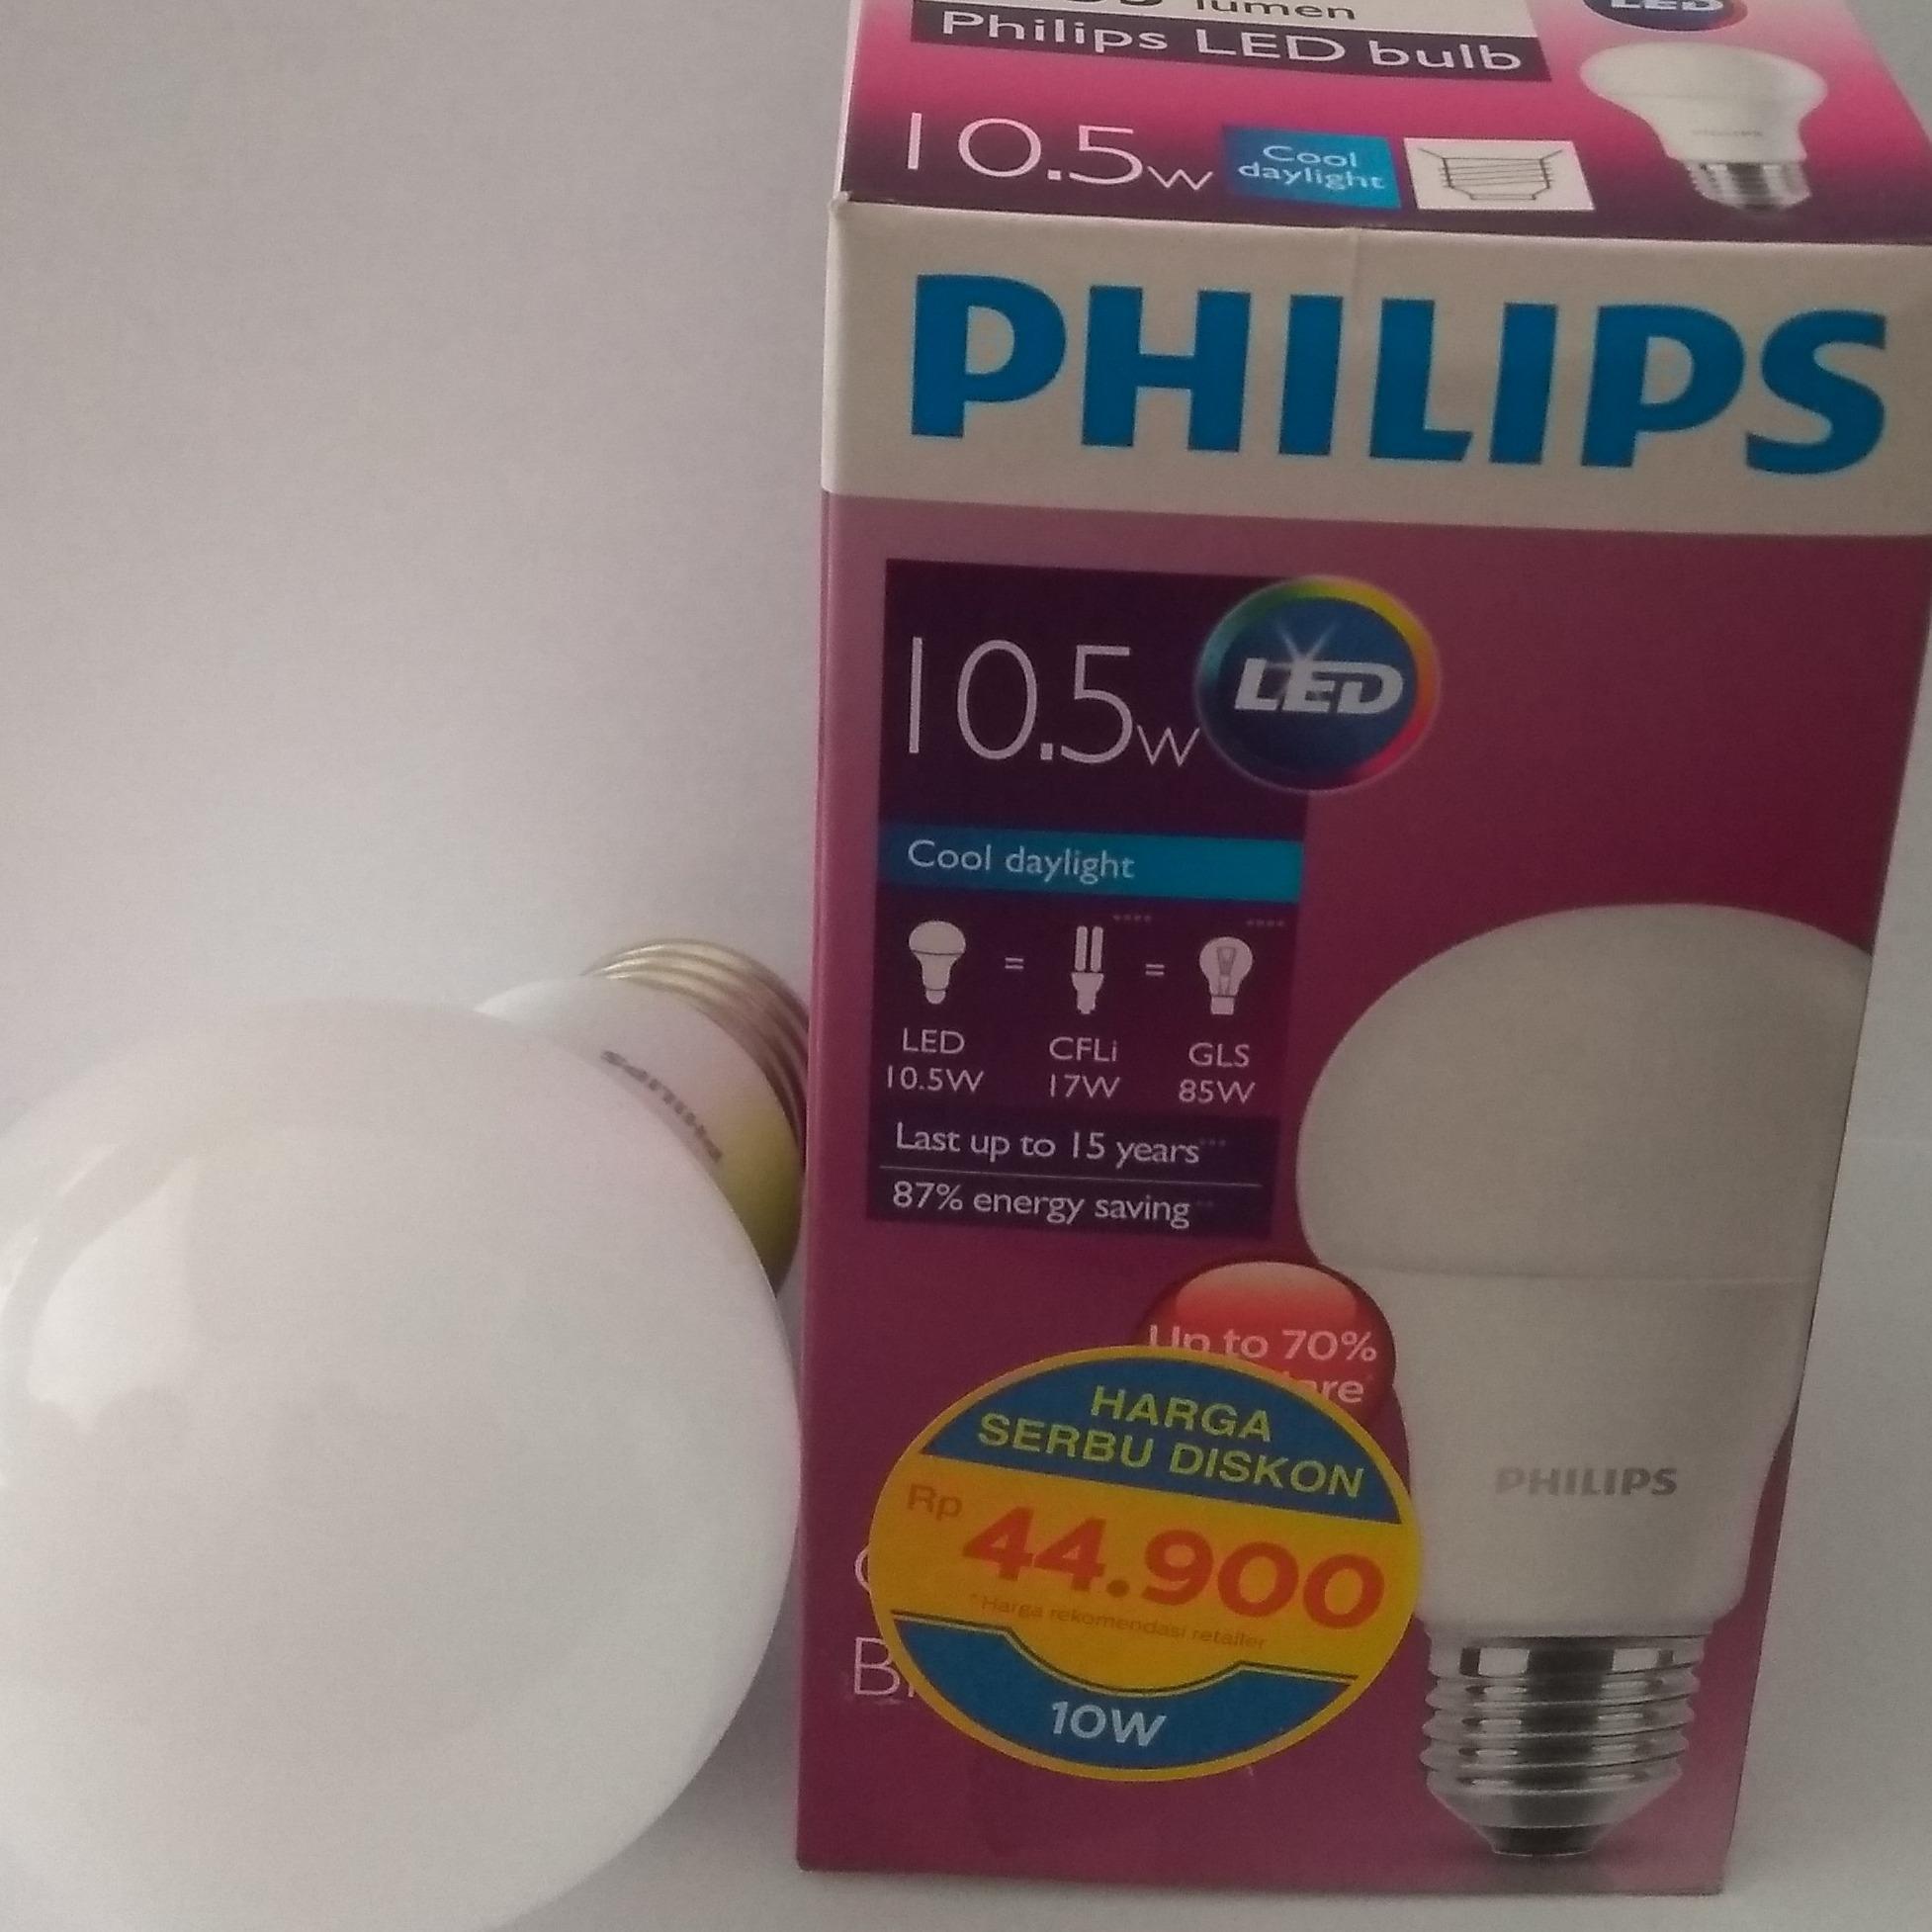 Hannochs Led Premier 3 Watt Lampu Hemat Energi 4 Pcs Page Philips 10 5